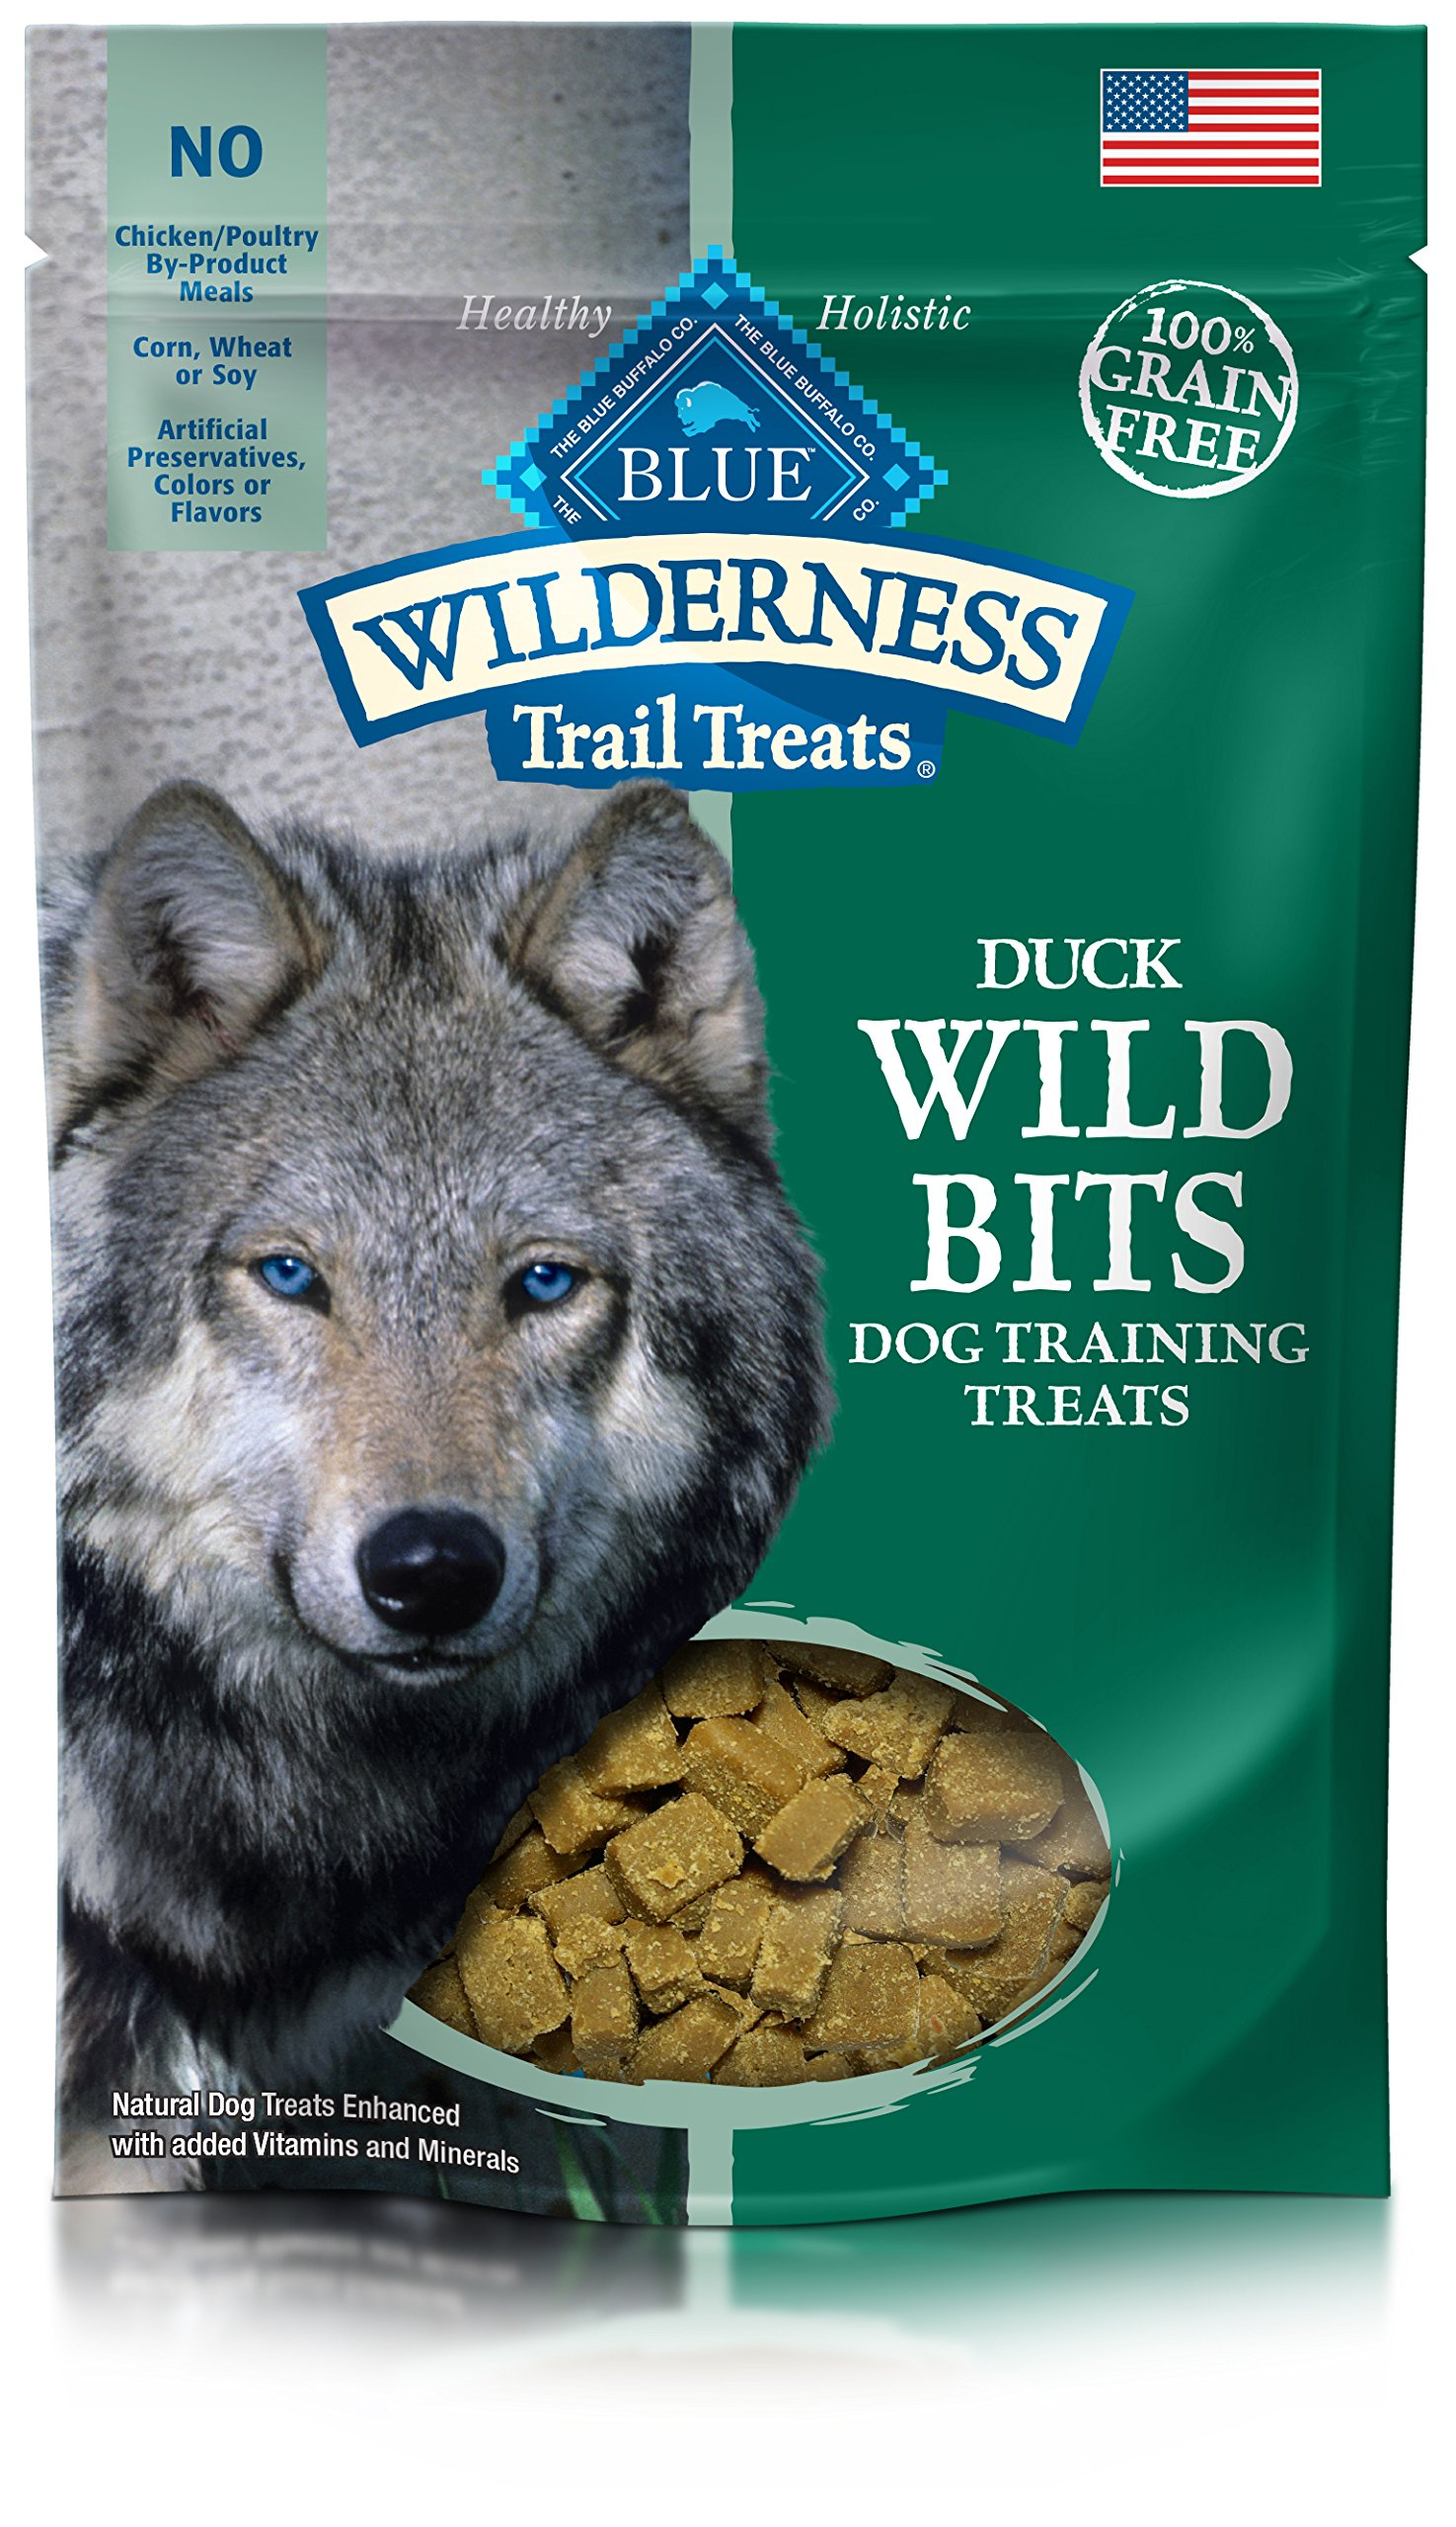 Blue-Buffalo-Wilderness-Trail-Treats-Wild-Bits-Grain-Free-Soft-Moist-Training-Dog-Treats-Duck-Recipe-4-oz-bag